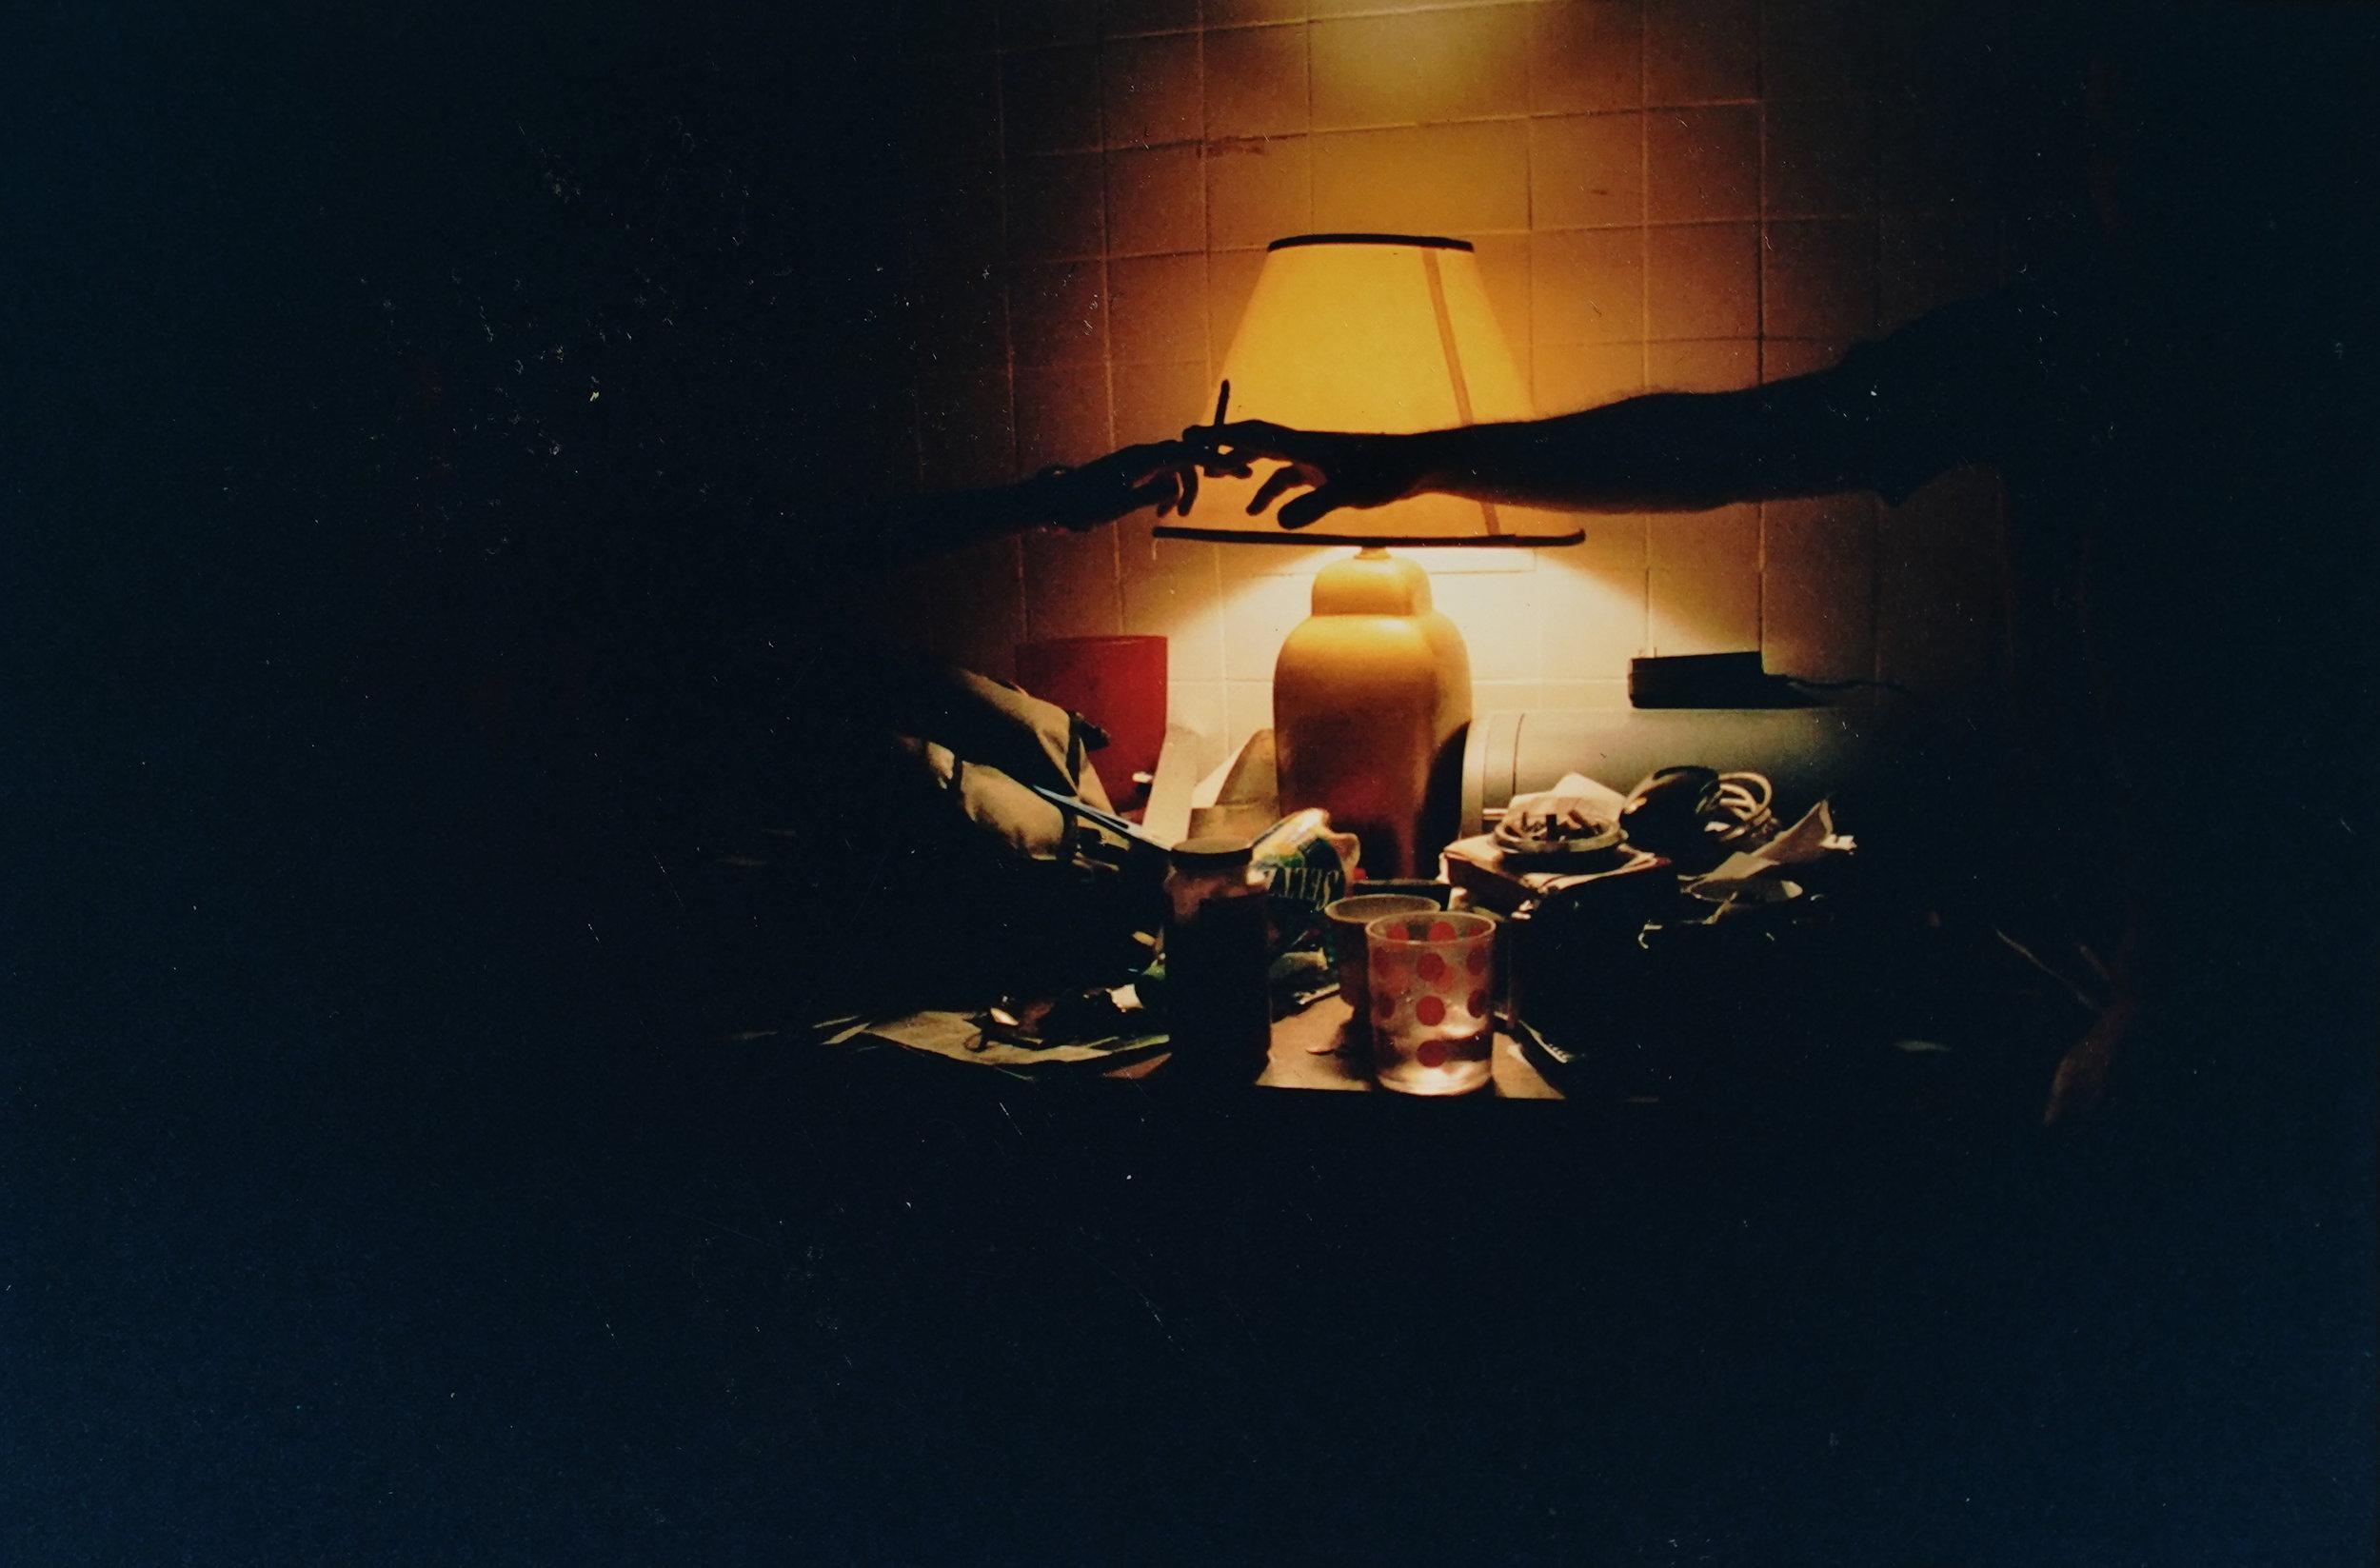 SHARED CIGARETTE (2004)